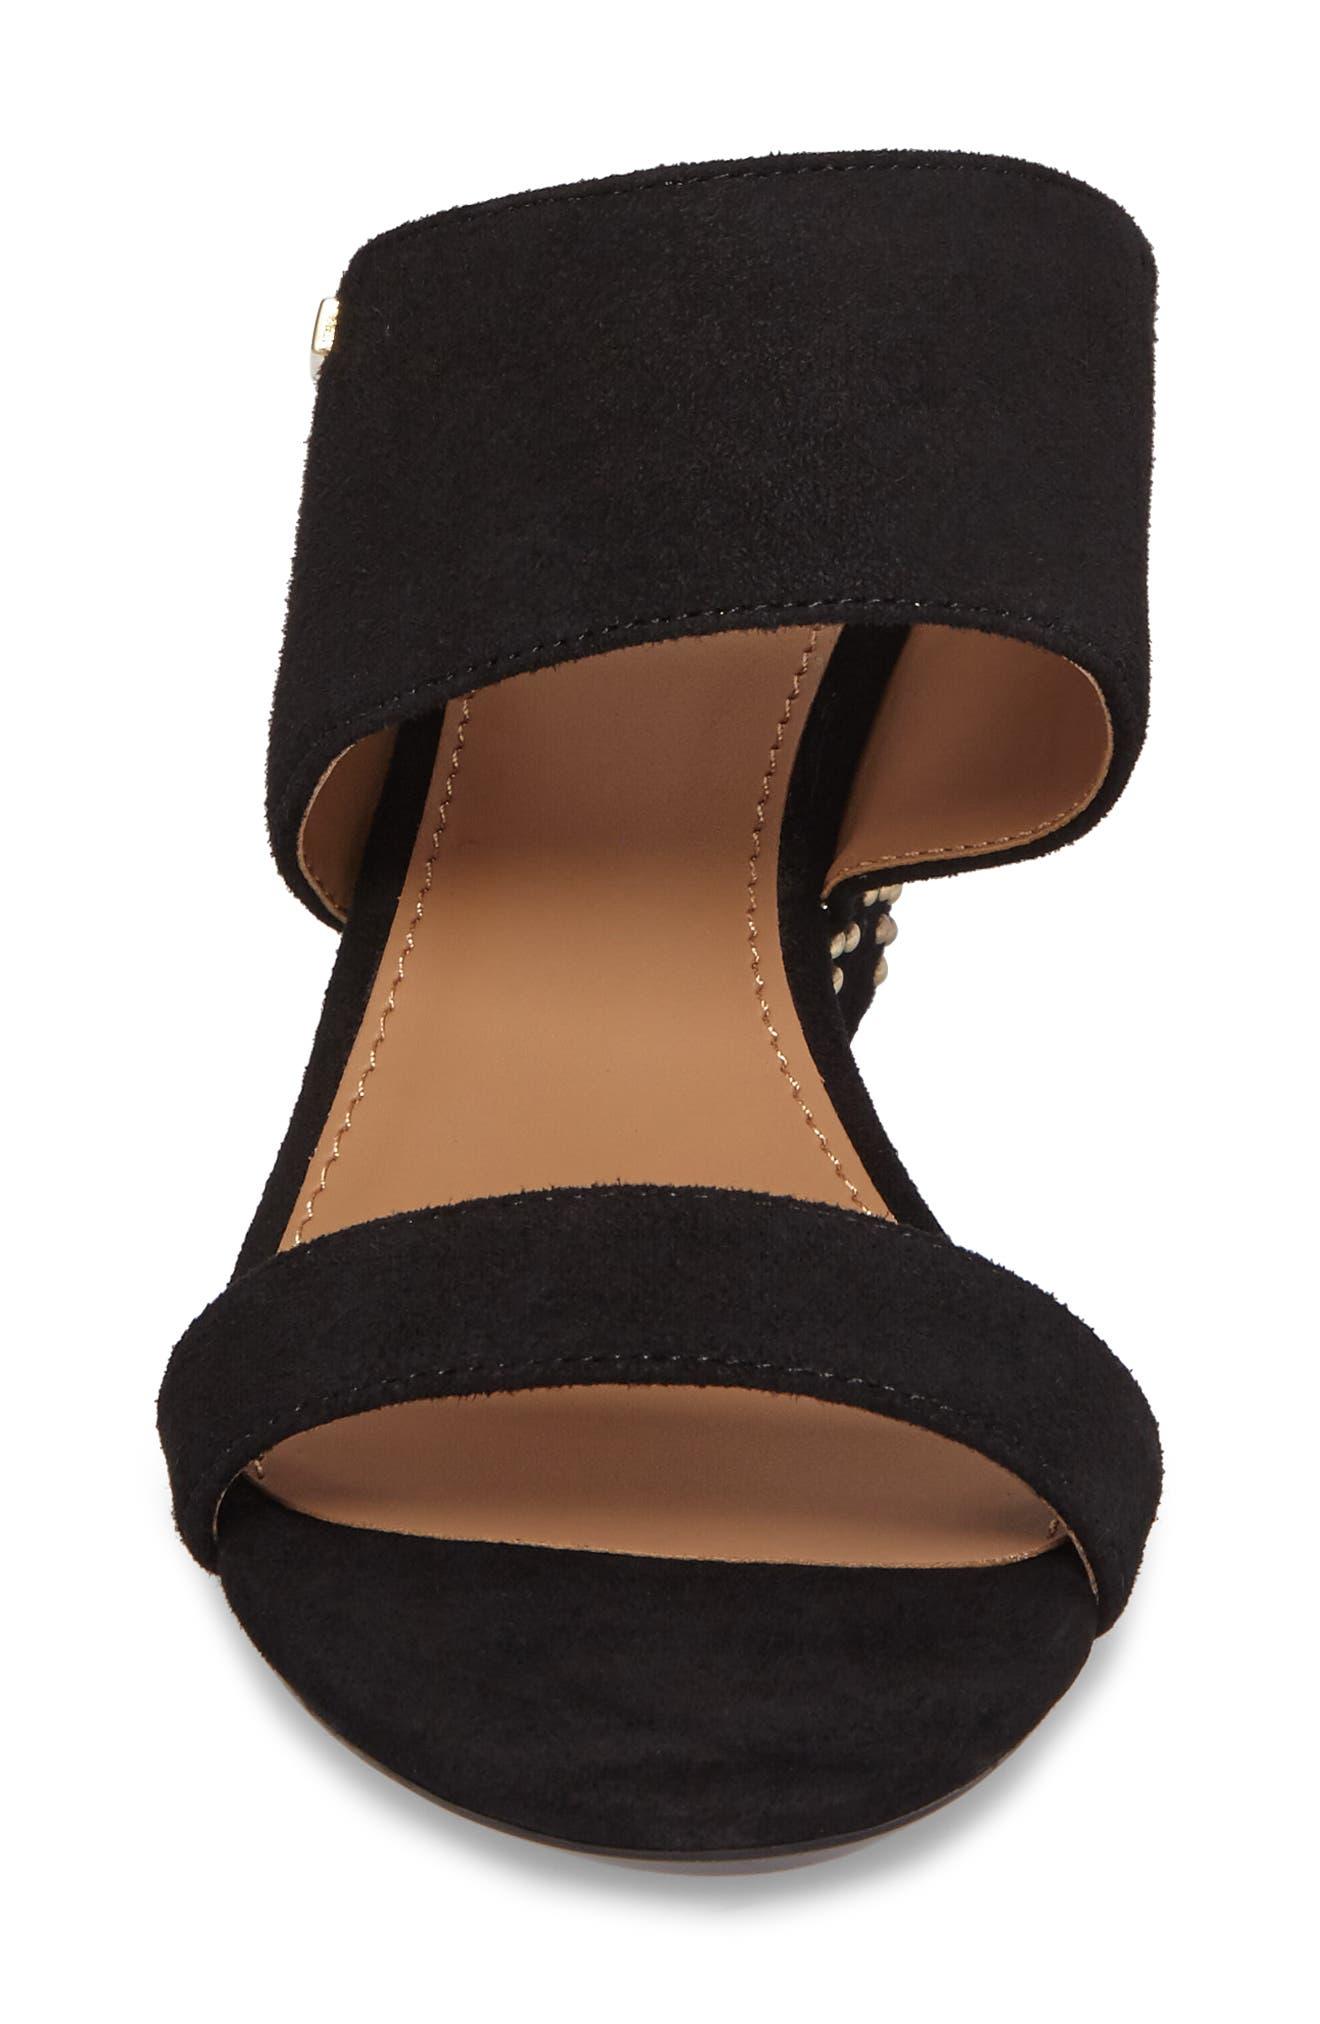 Phyllis Studded Wedge Sandal,                             Alternate thumbnail 13, color,